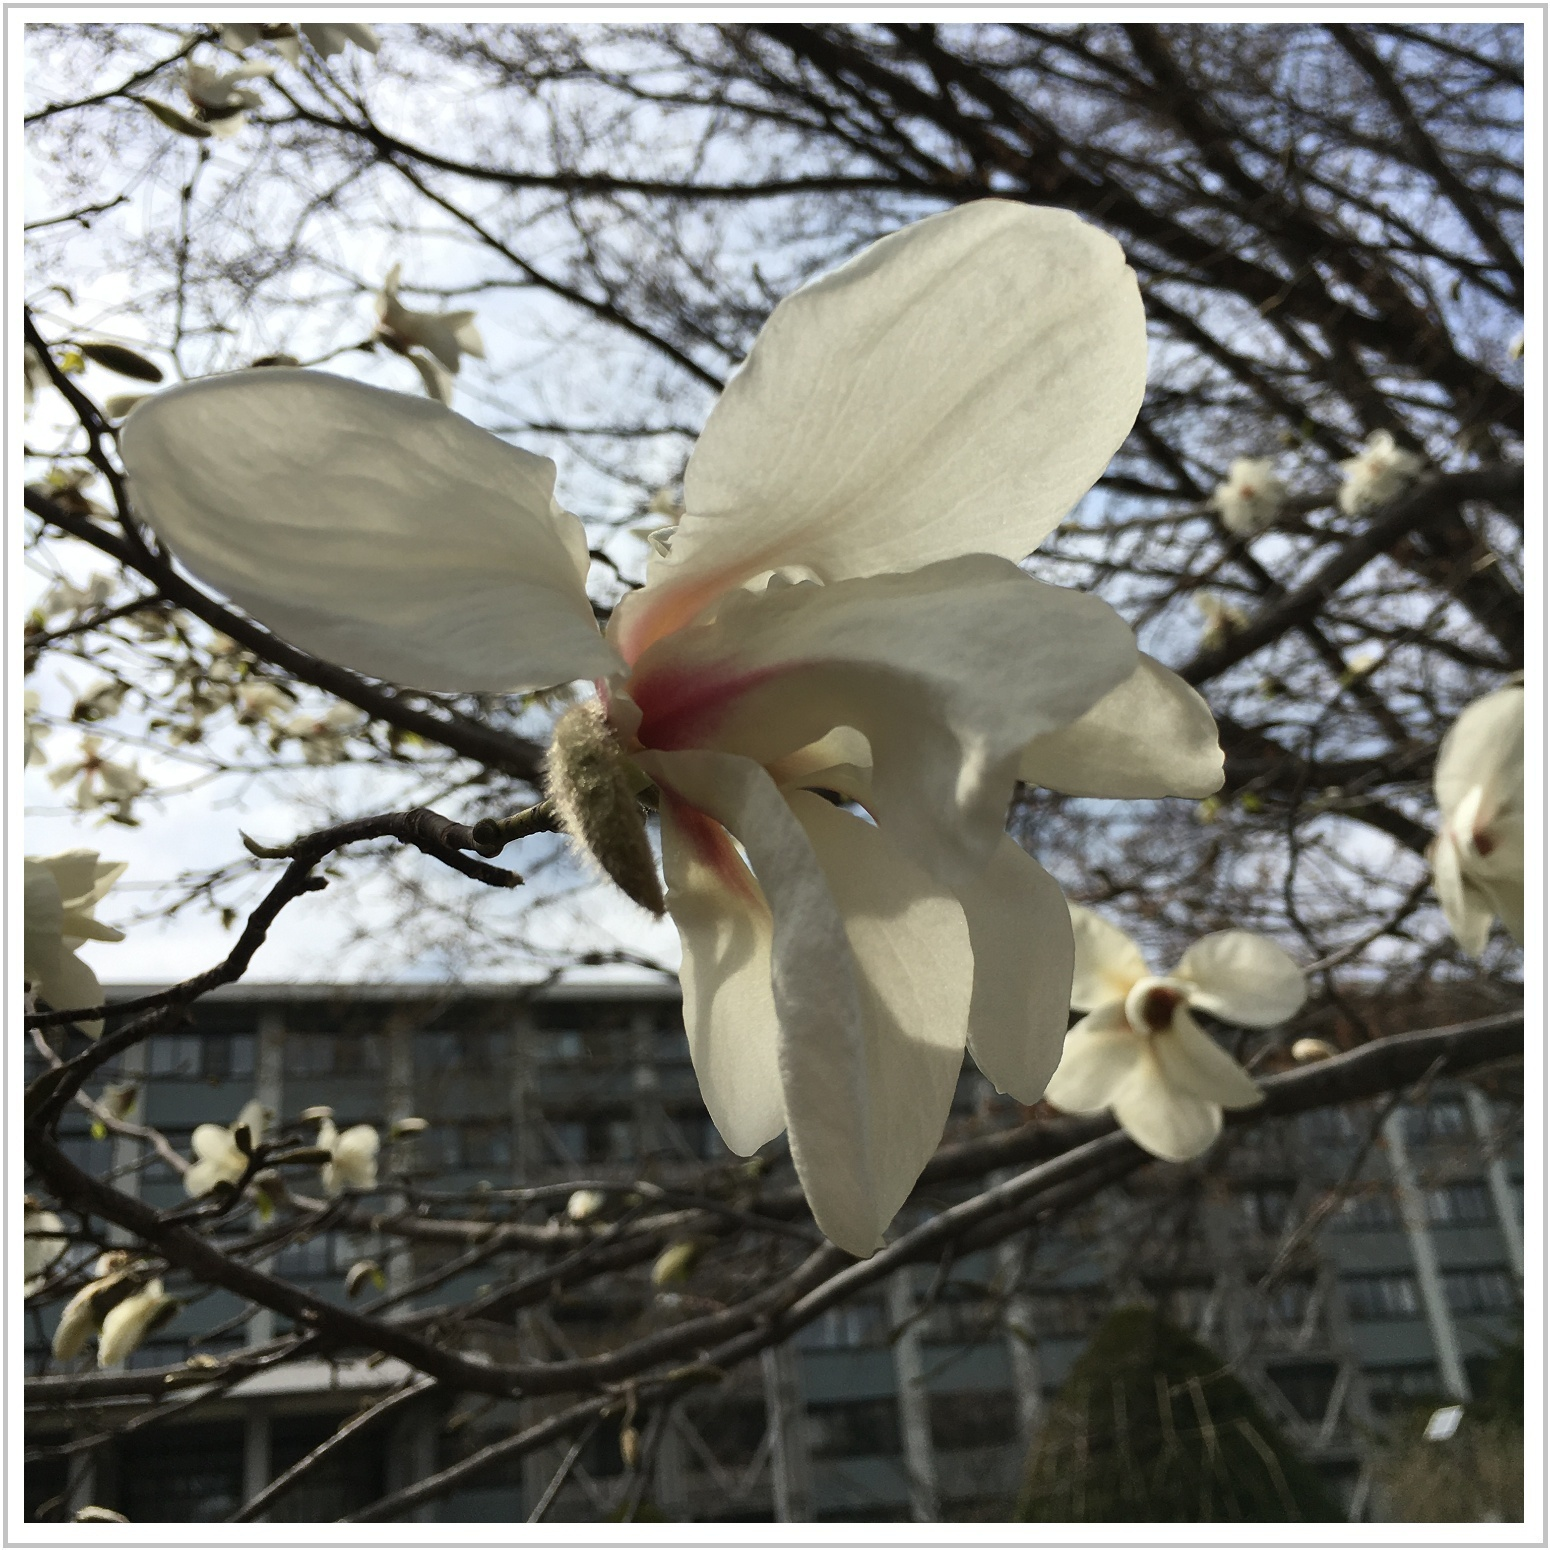 kobushi_1_425.jpg